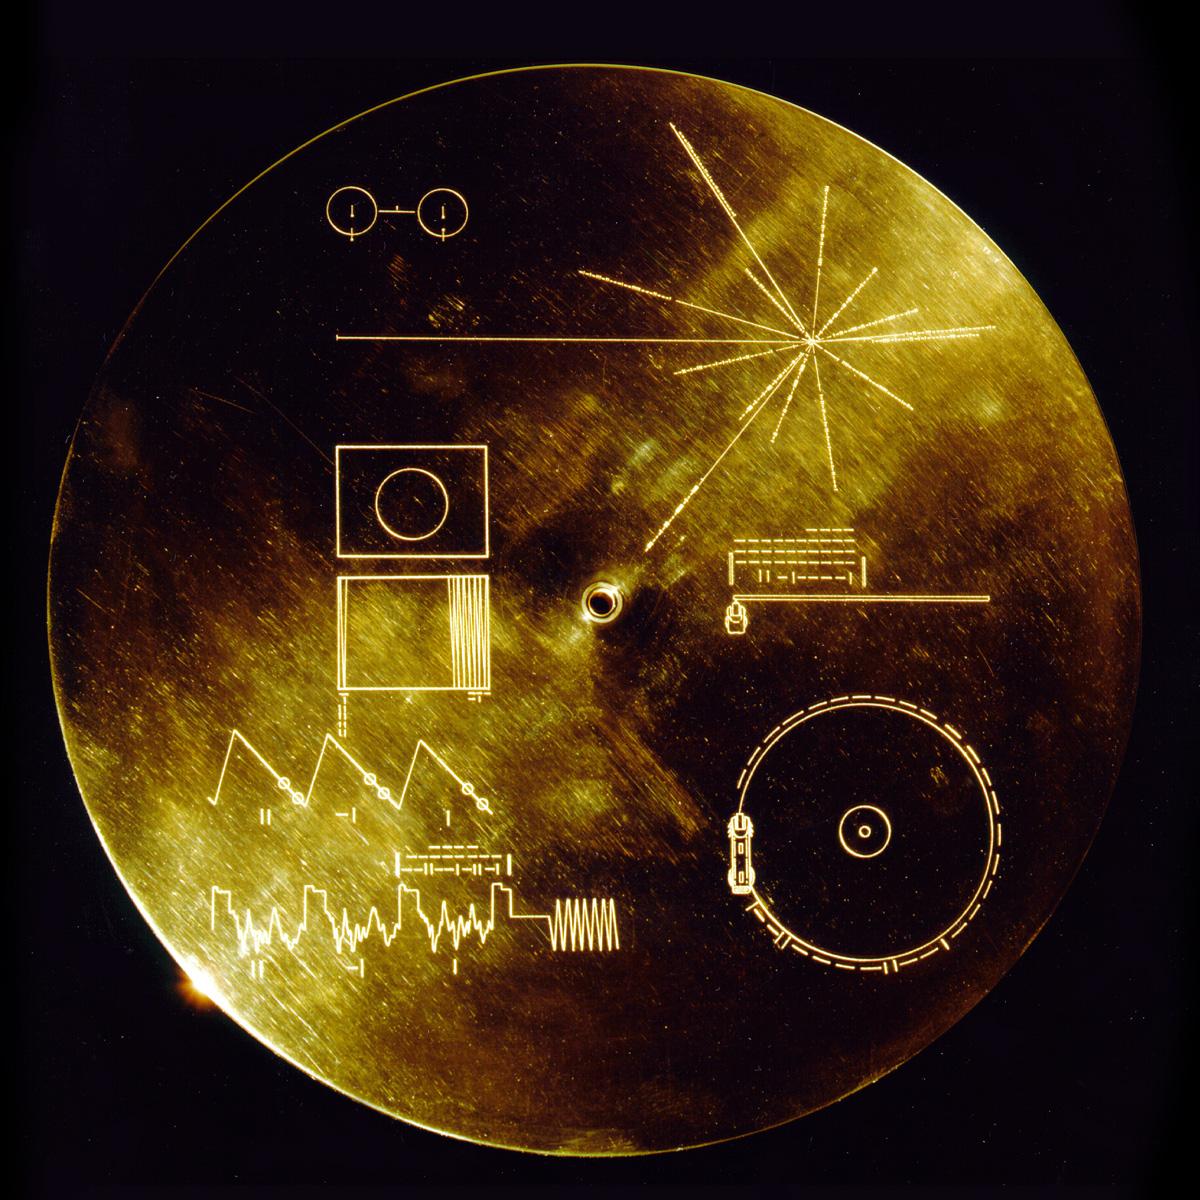 voyager-1-2-golden-record-replica-4